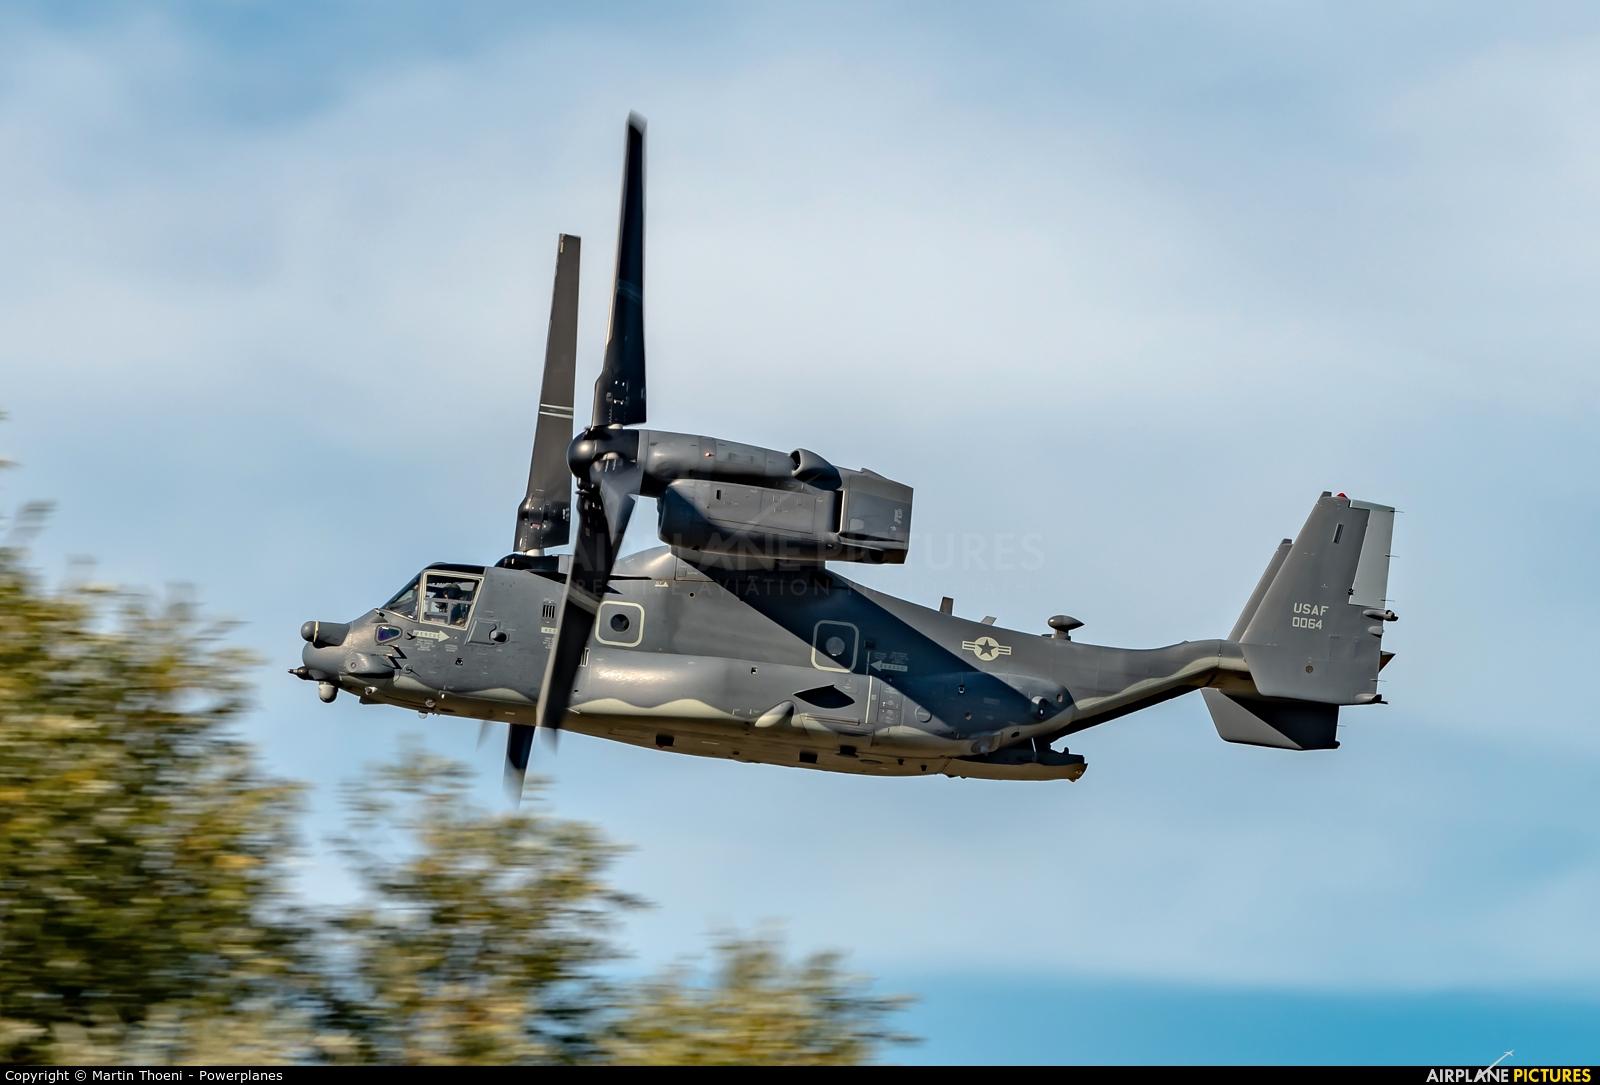 USA - Air Force 12-0064 aircraft at Kleine Brogel